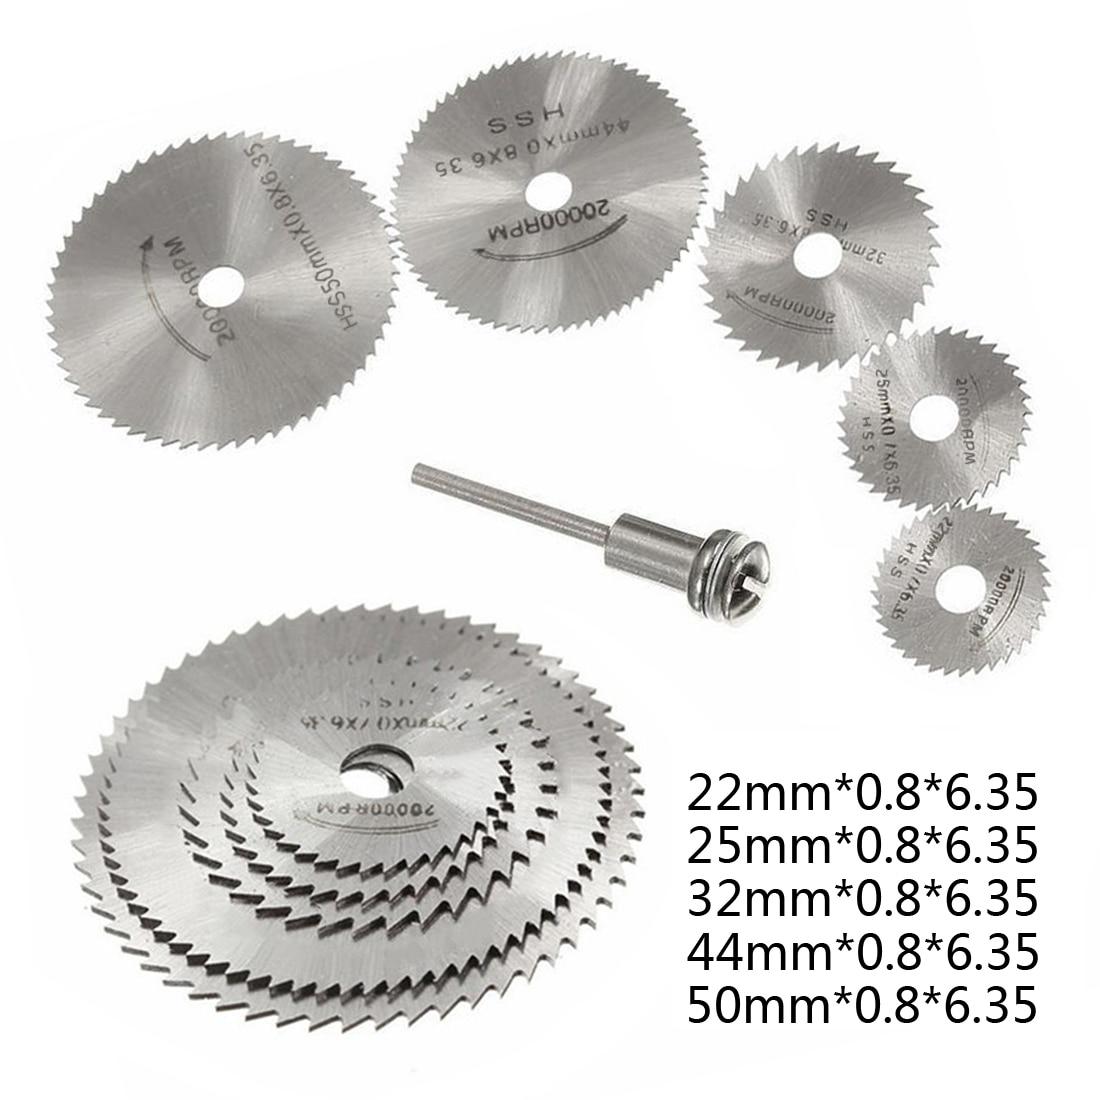 HSS Circular Saw Blade Rotary Tool For Dremel Metal Cutter Power Tool Set Wood Cutting Discs Drill Mandrel Cut Off